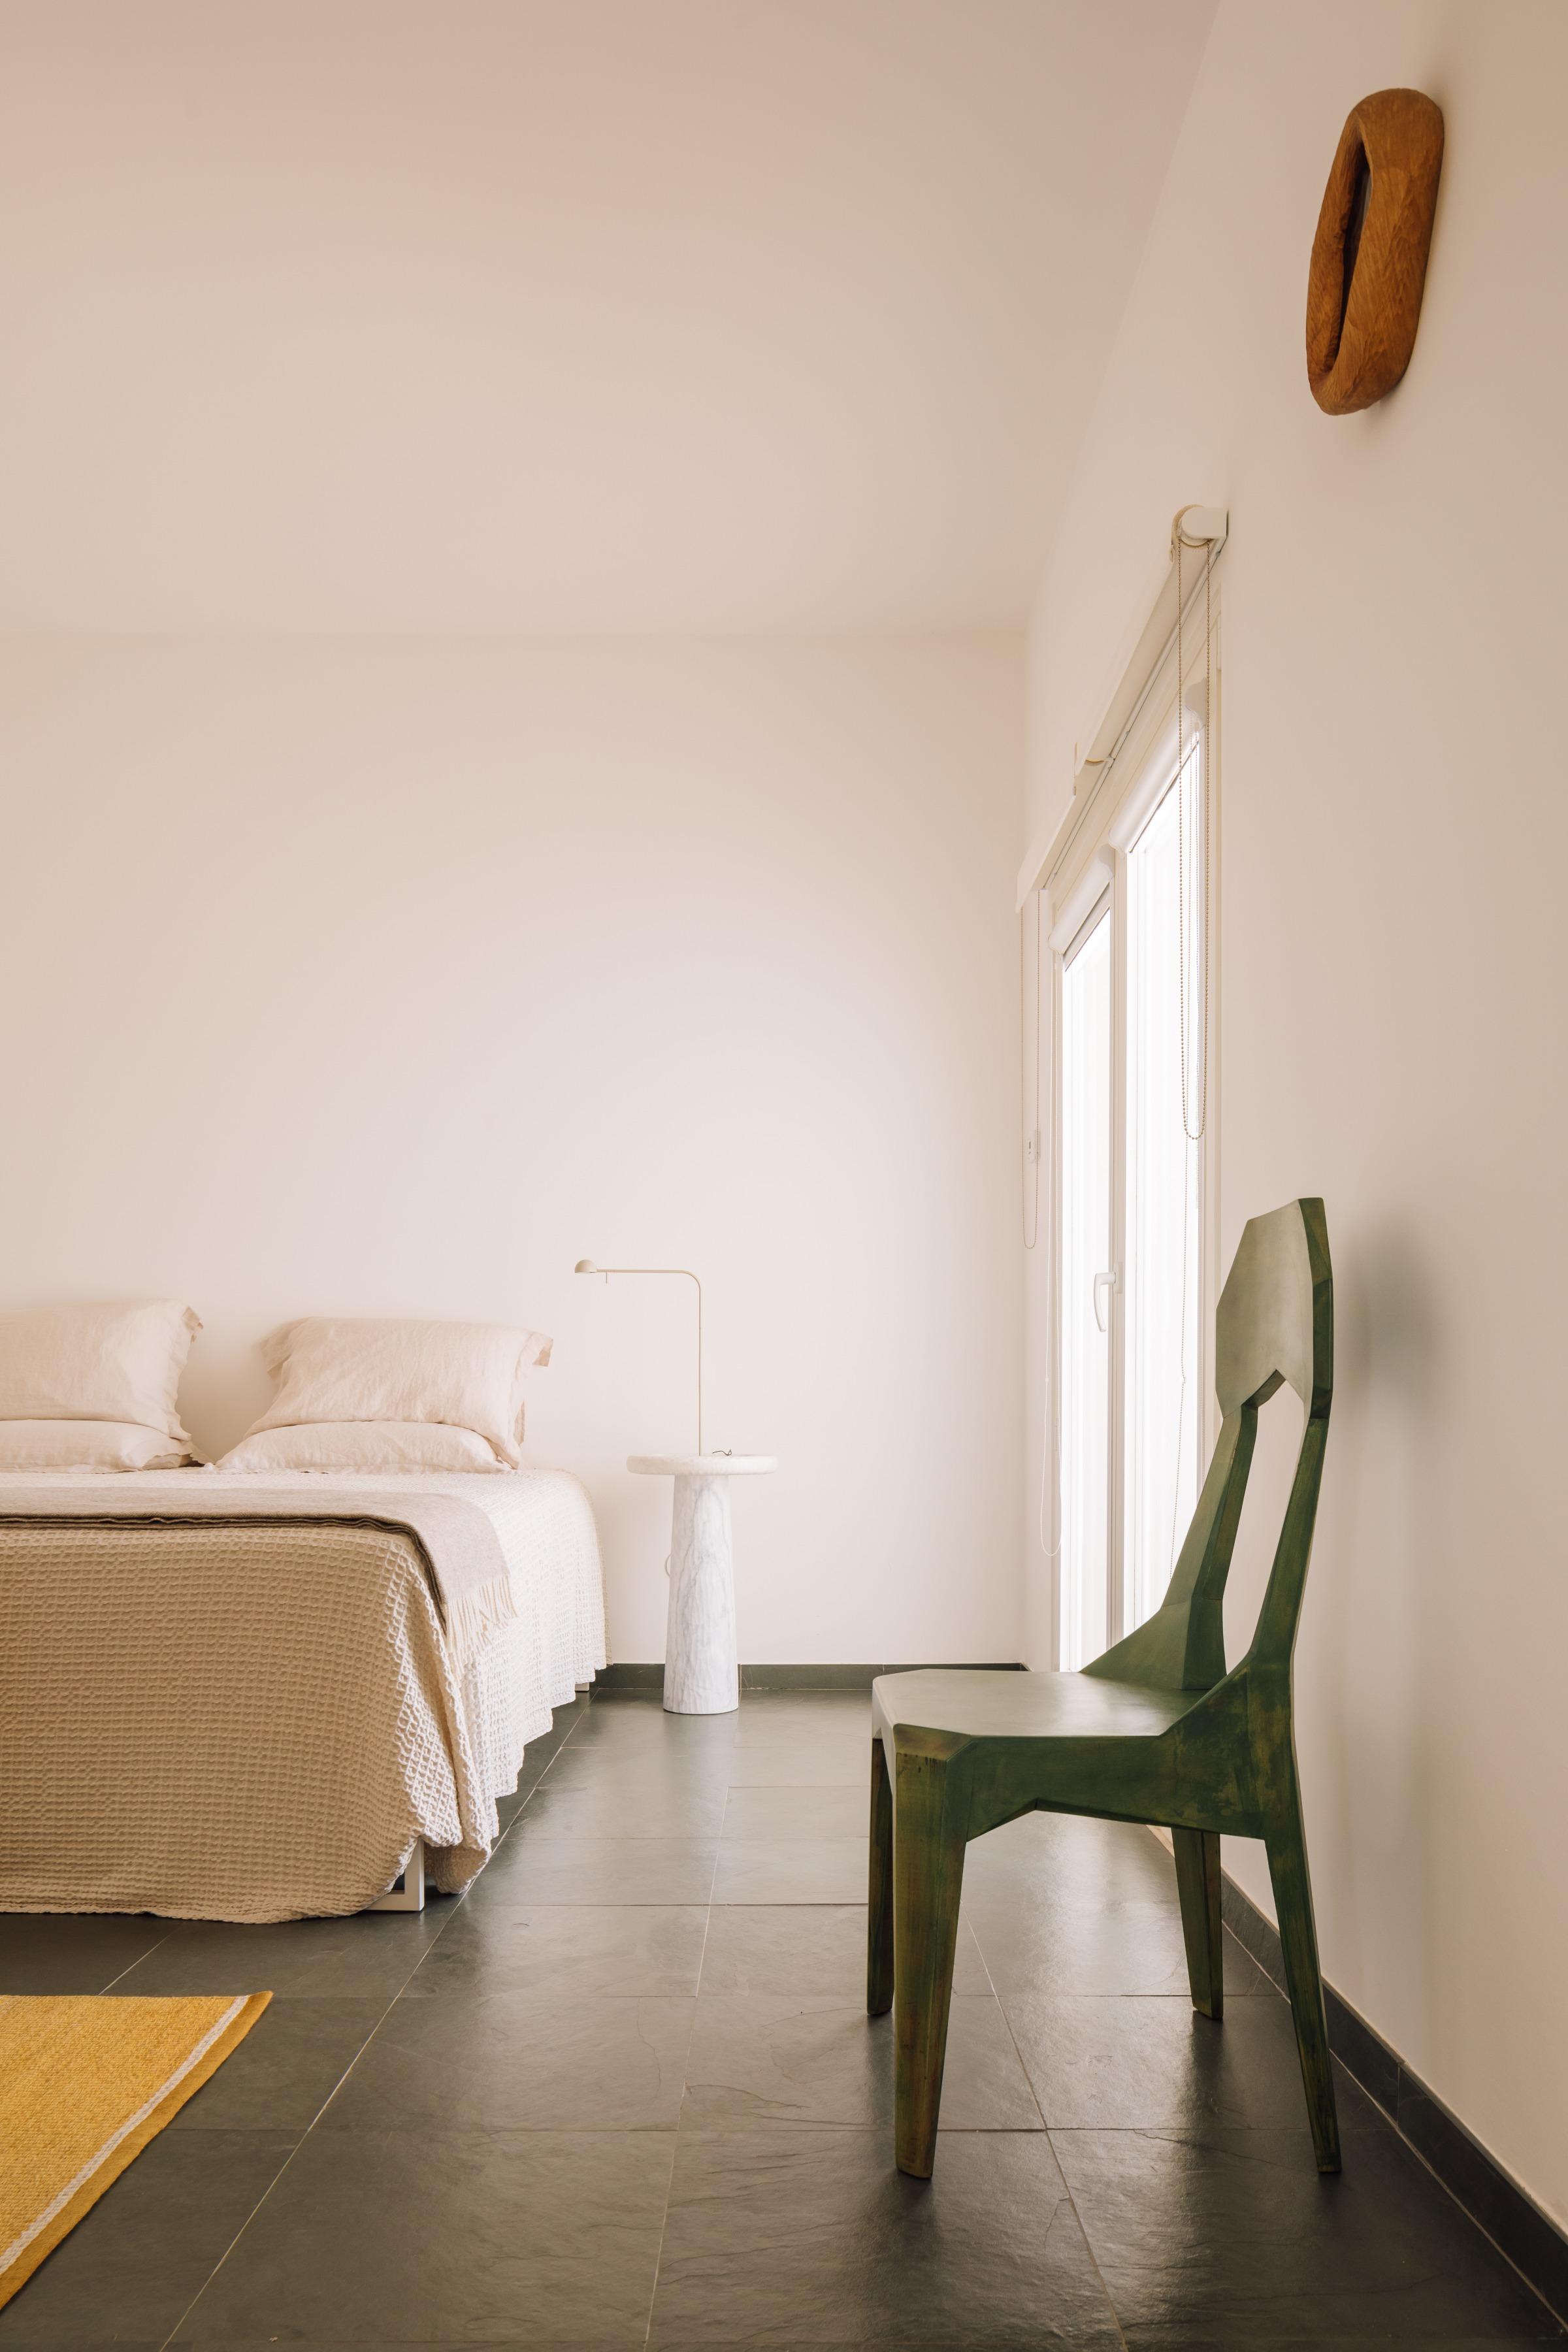 Dalicenca pt stay suite mypool 7